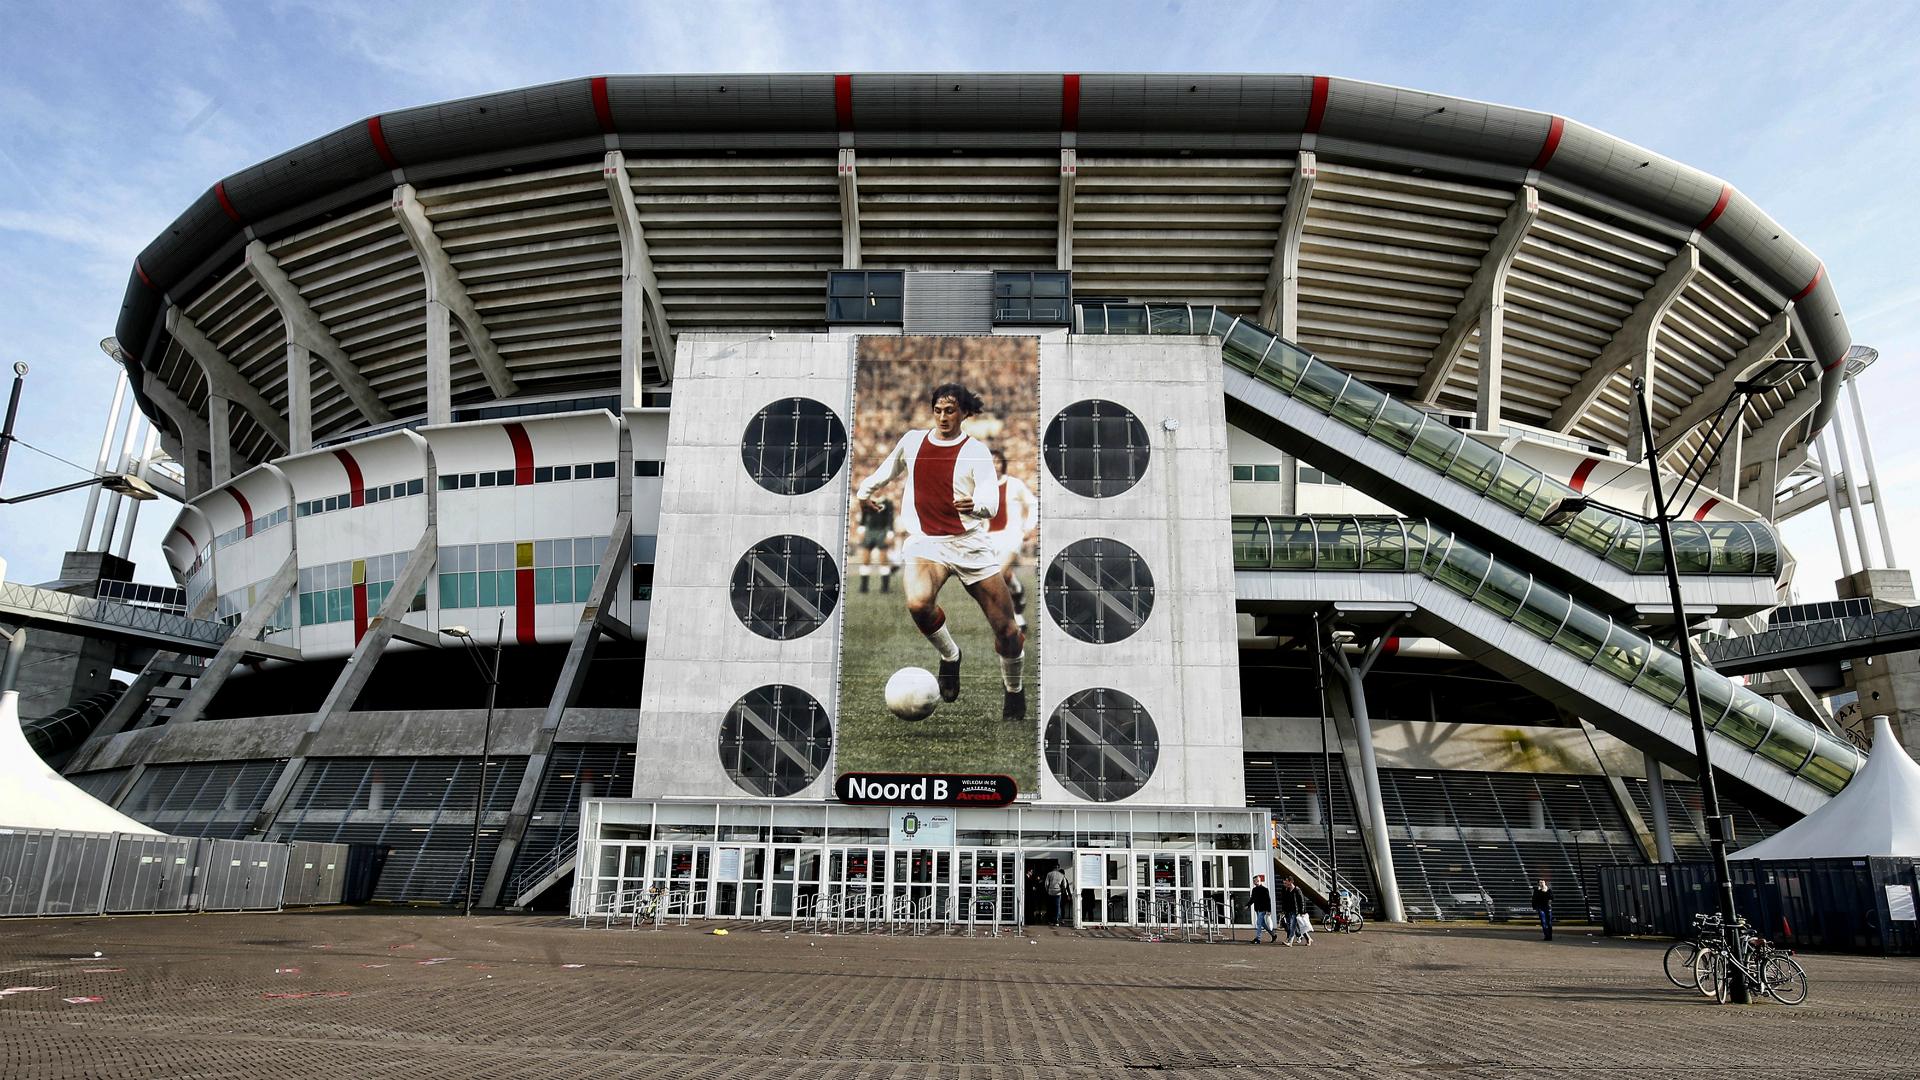 Juventus, scontri prima della partita con l'Ajax: 120 tifosi fermati